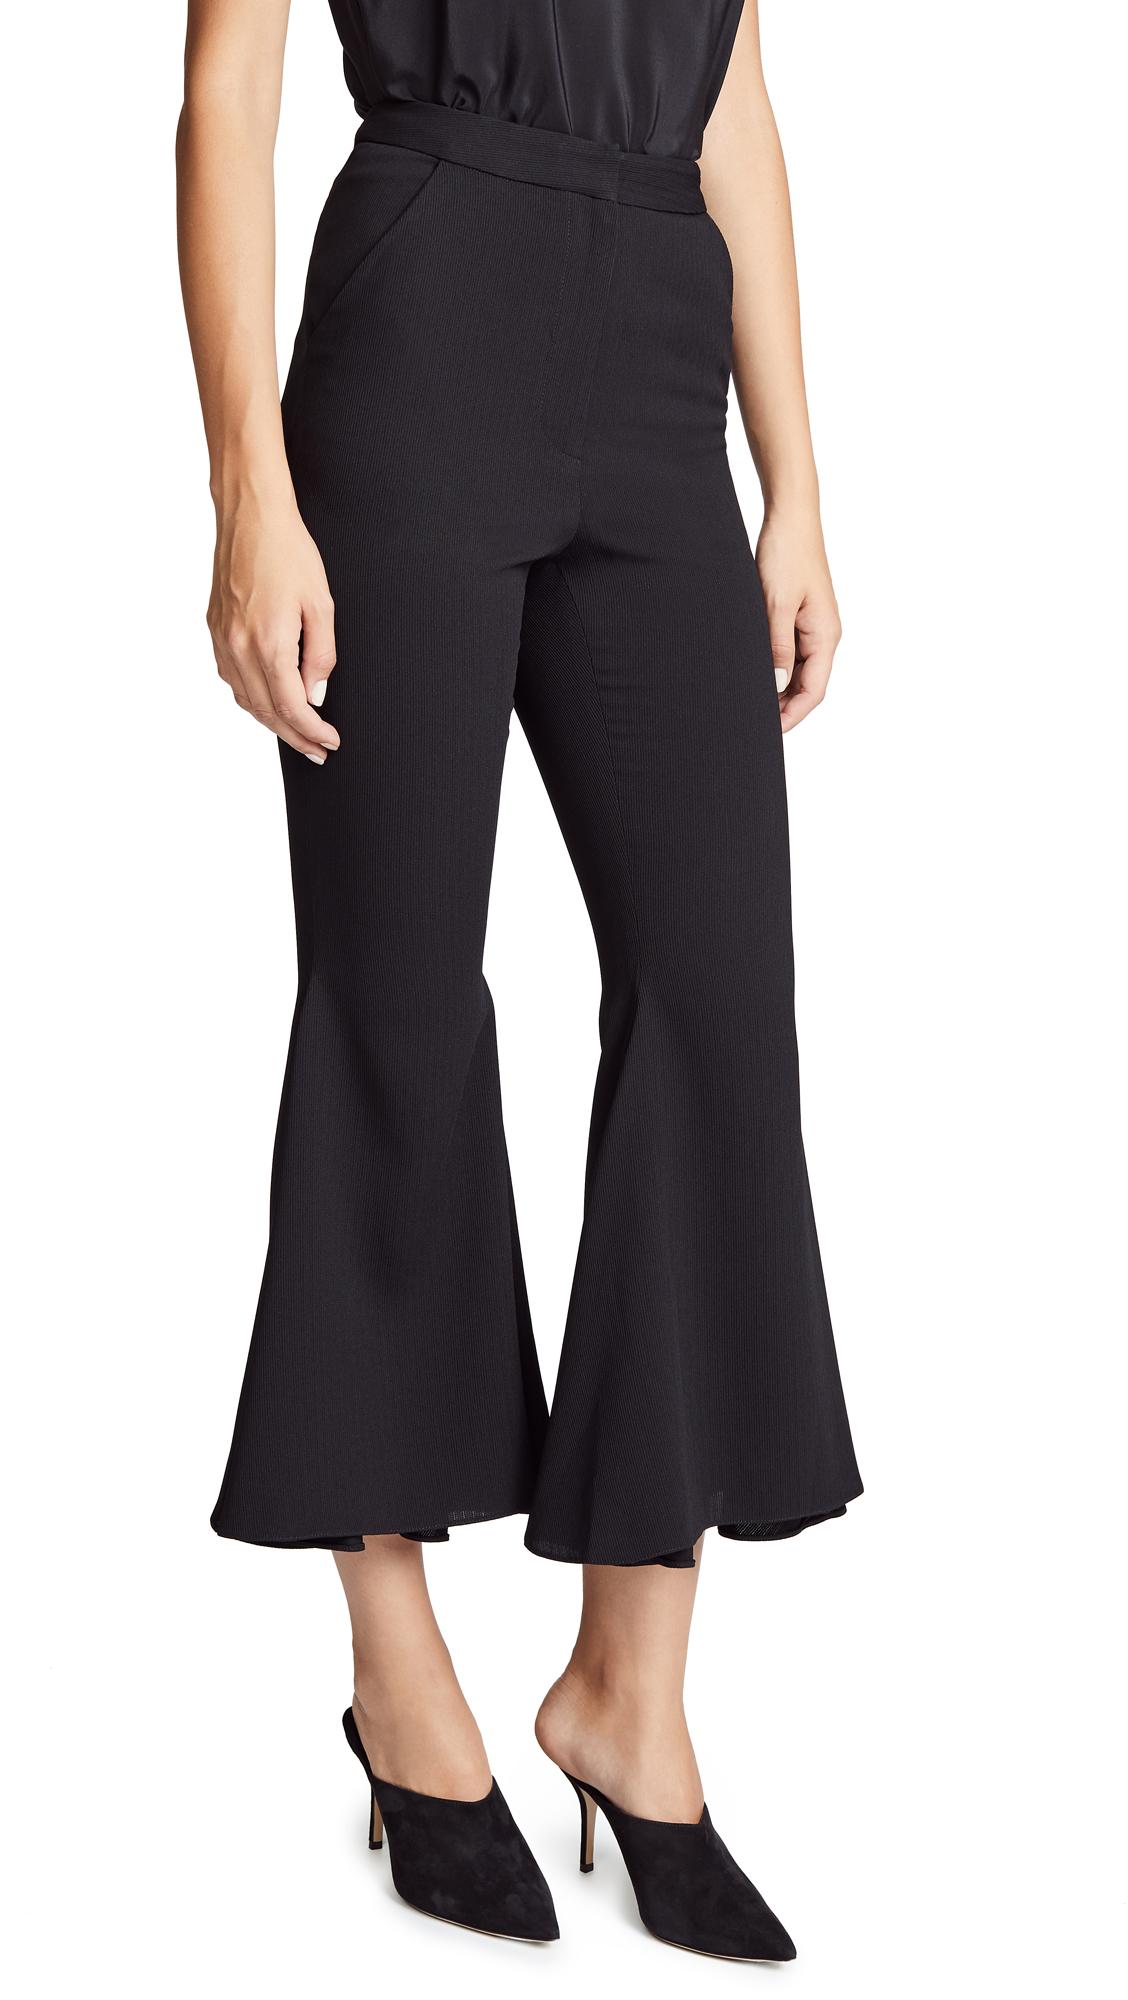 VATANIKA Flare Pants in Black